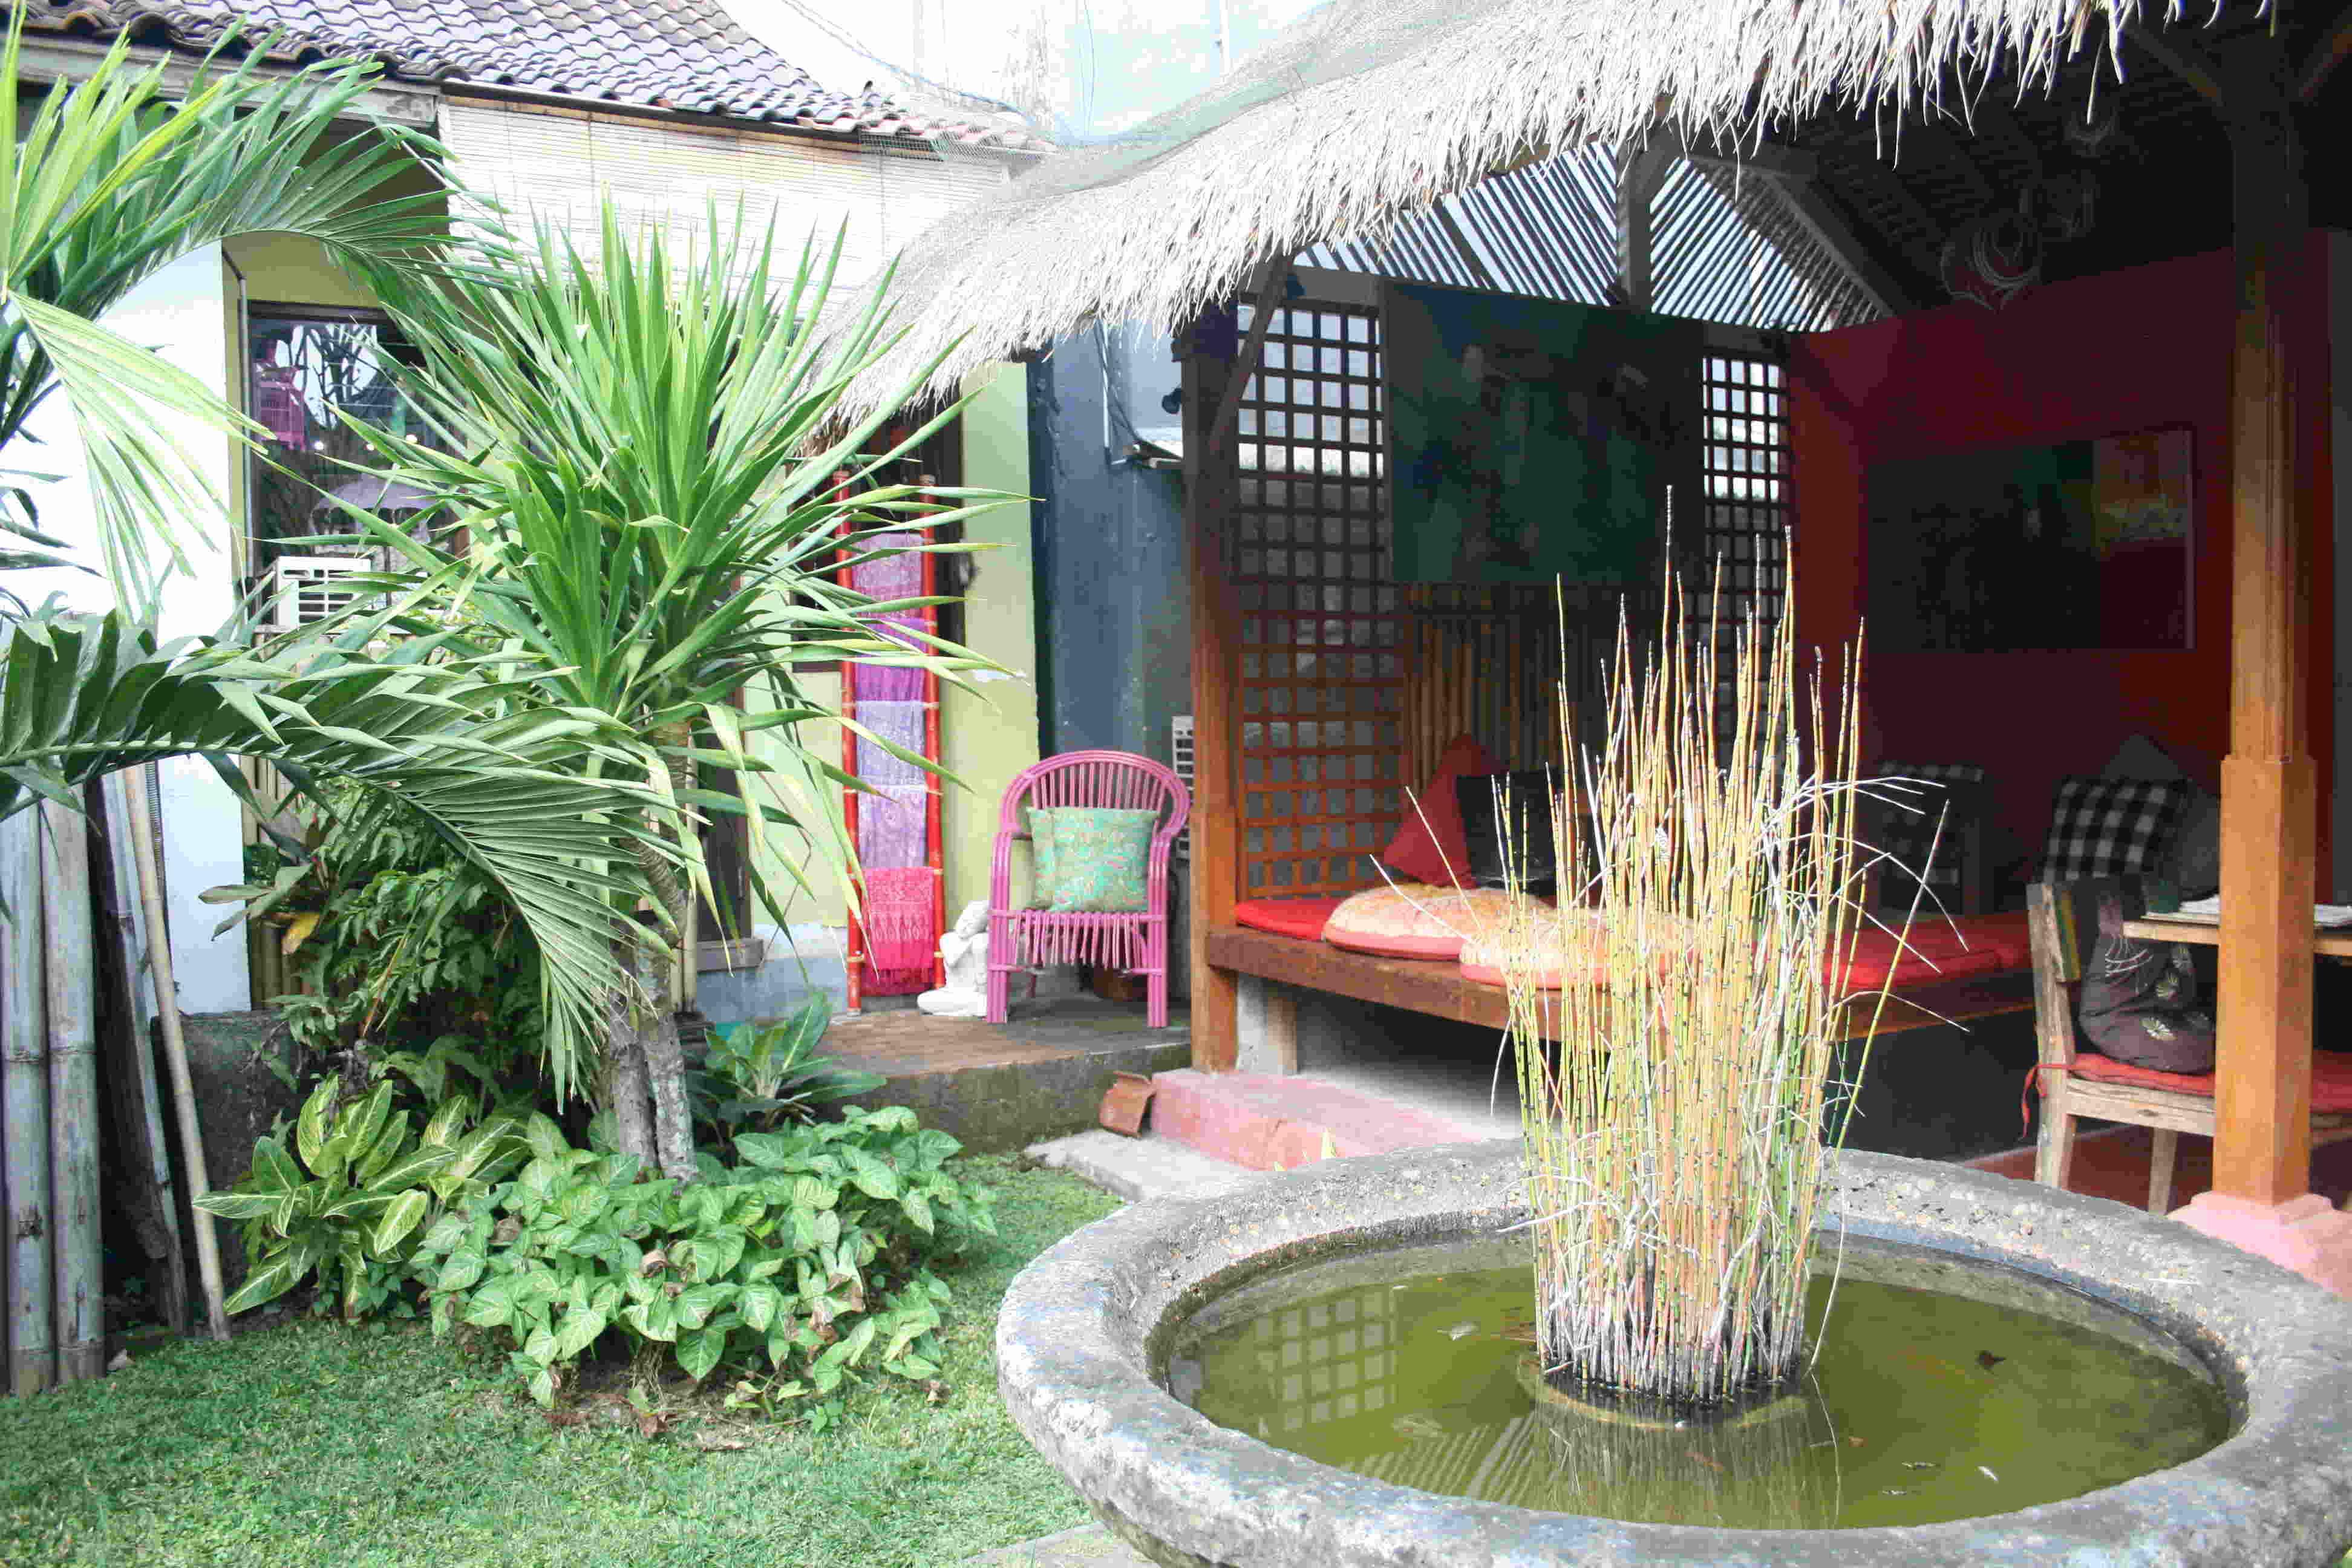 Ubud ans its restaurants